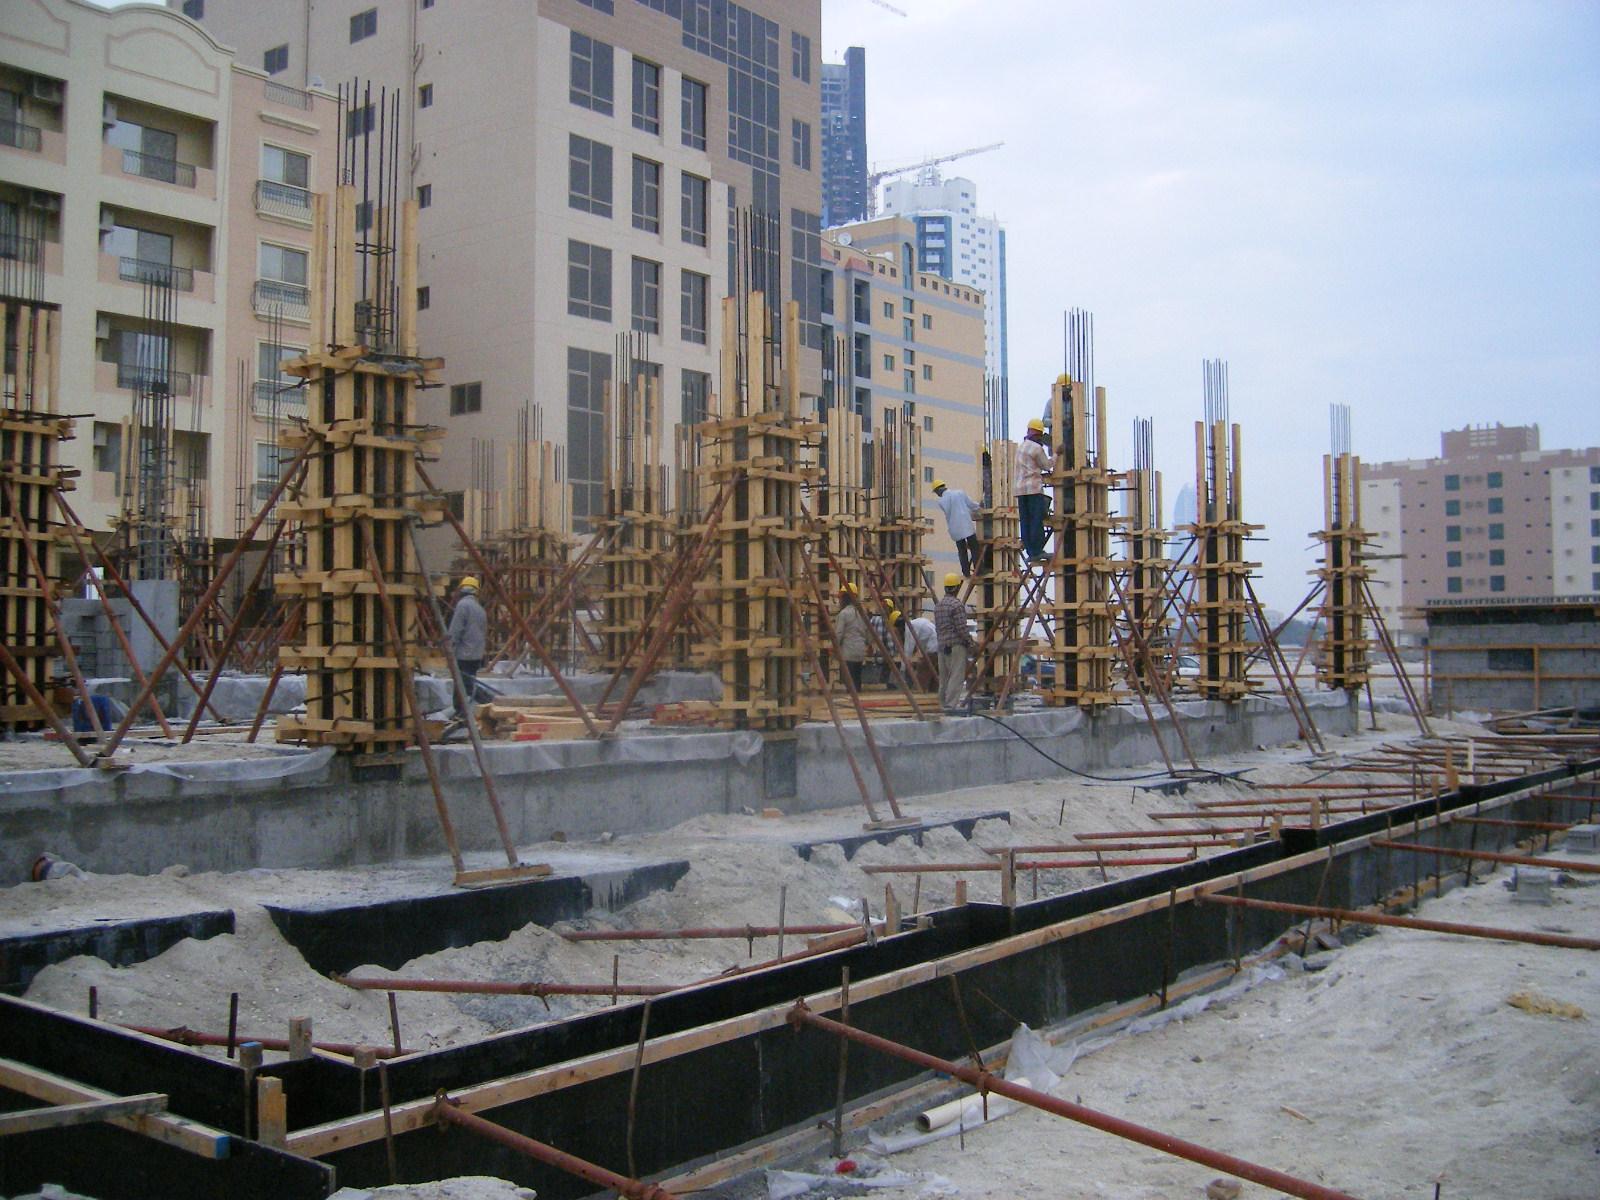 Sanabis (Bahrain) Daily Photo: Construction Site